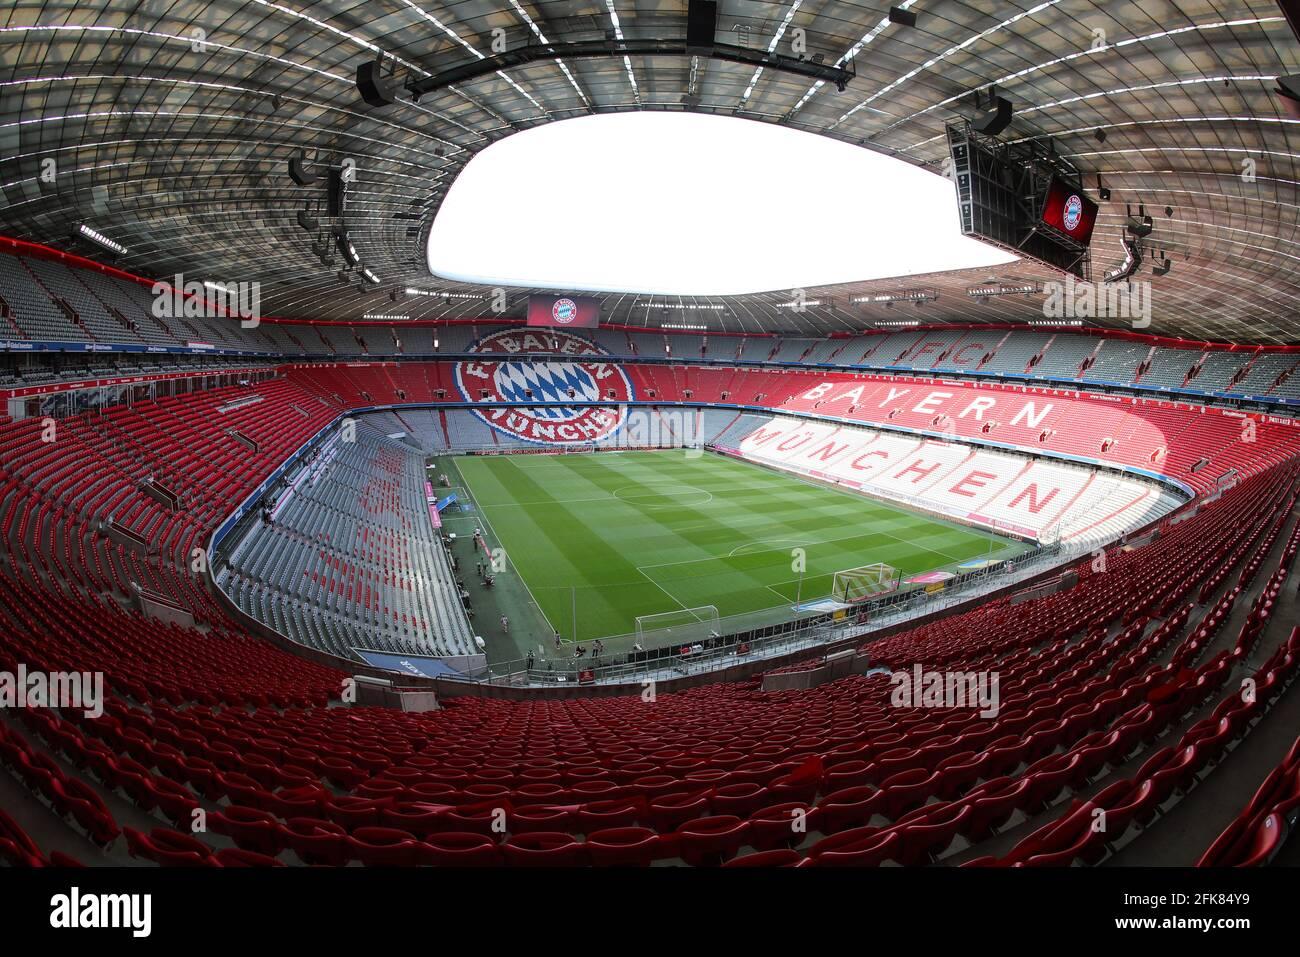 Stadion Allianz Arena in Muenchen Froettmaning for the UEFA Euro 2020 / 2021 football European Championship   Football Stadium from FC Bayern Munich  © diebilderwelt / Alamy Stock Stock Photo